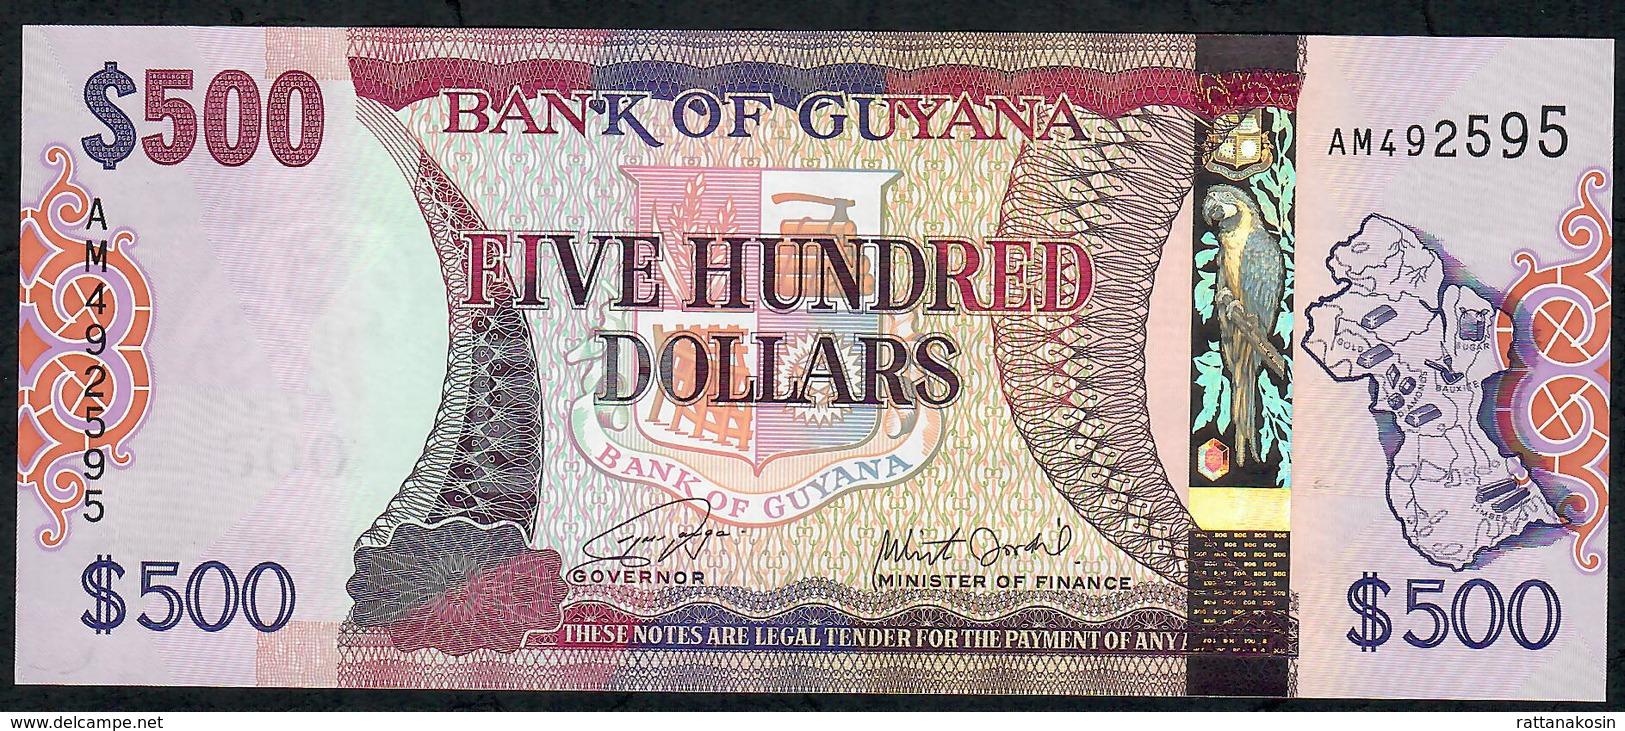 GUYANA P37b 500 DOLLARS (2015) Signature 16 (new Signature ) #AM    UNC. - Guyana